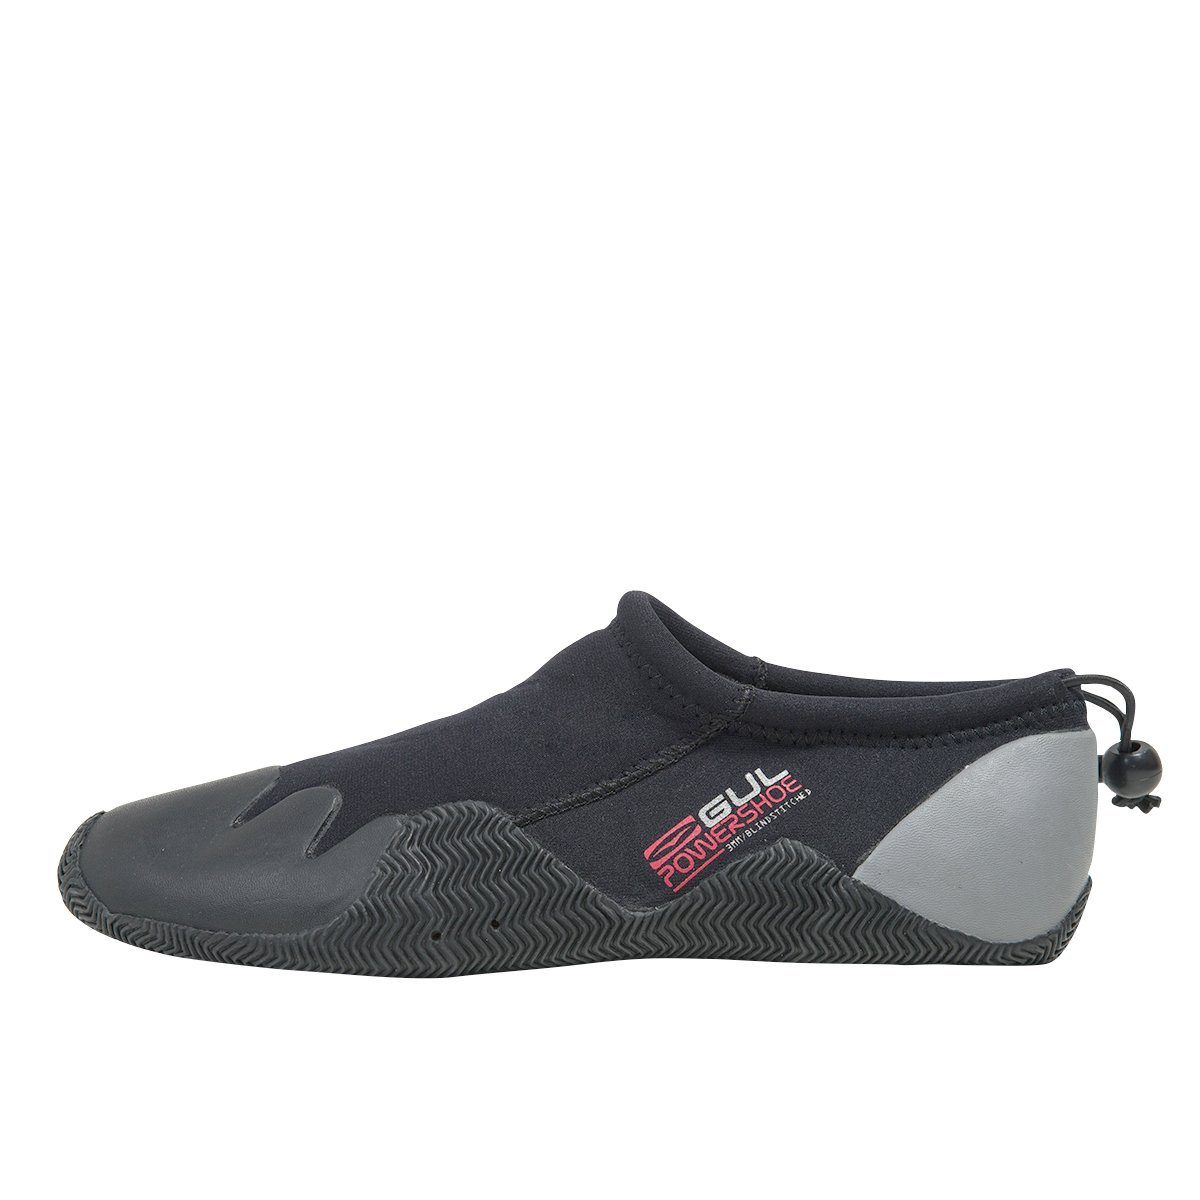 183b19703db3 Gul 3mm Neoprene Power Shoe BLACK GREY  Amazon.co.uk  Sports   Outdoors